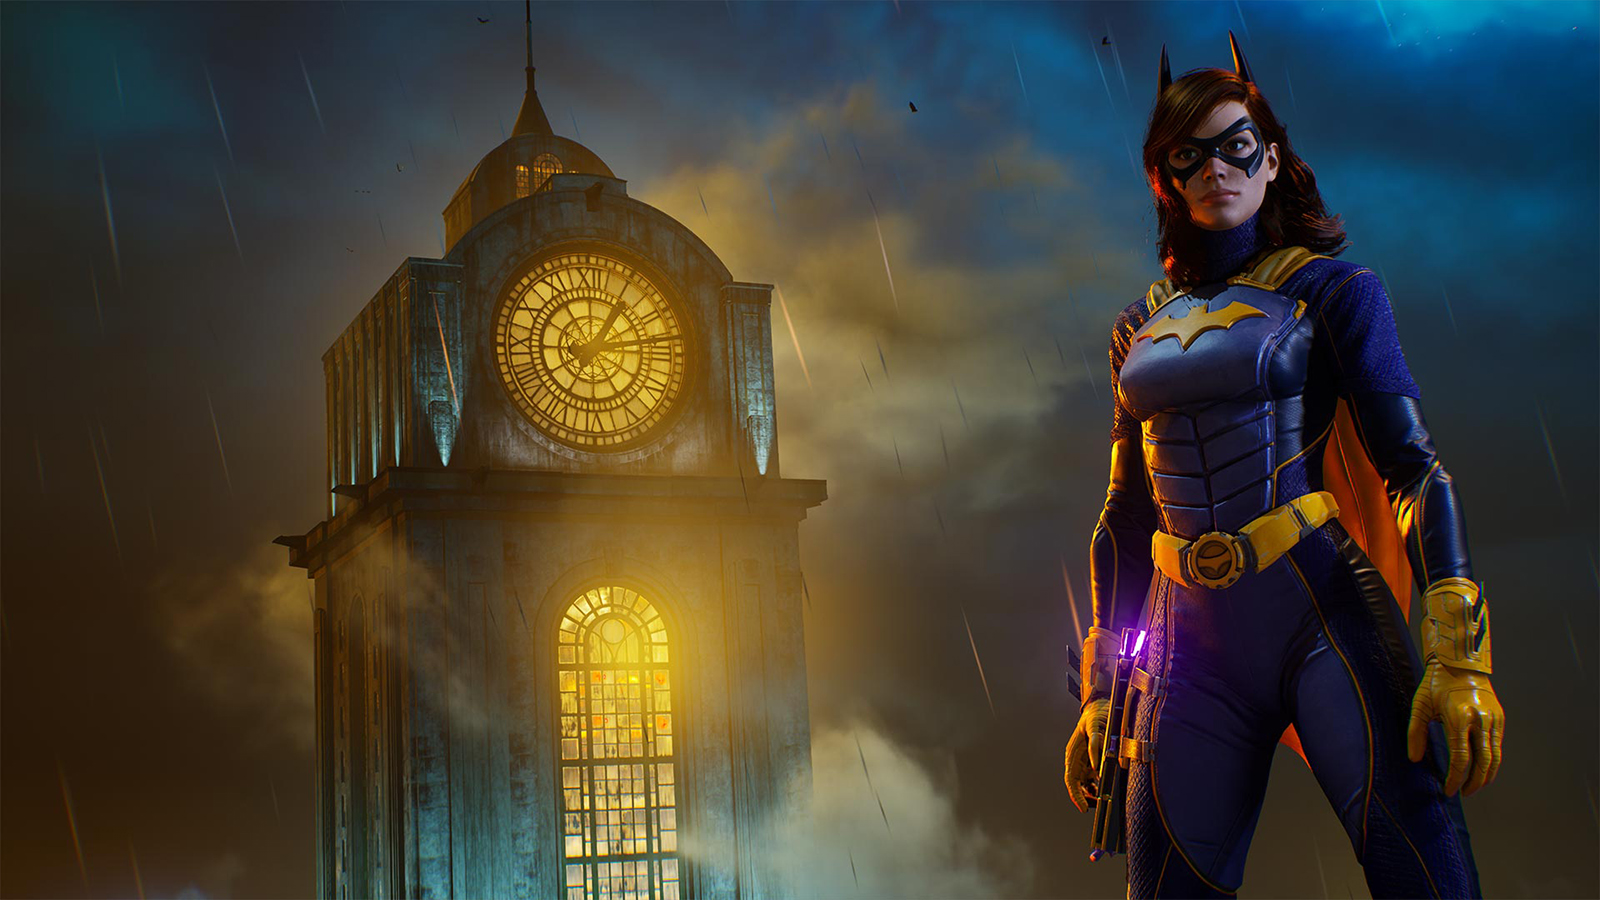 Batgirl standing by a clocktower in Gotham Knights